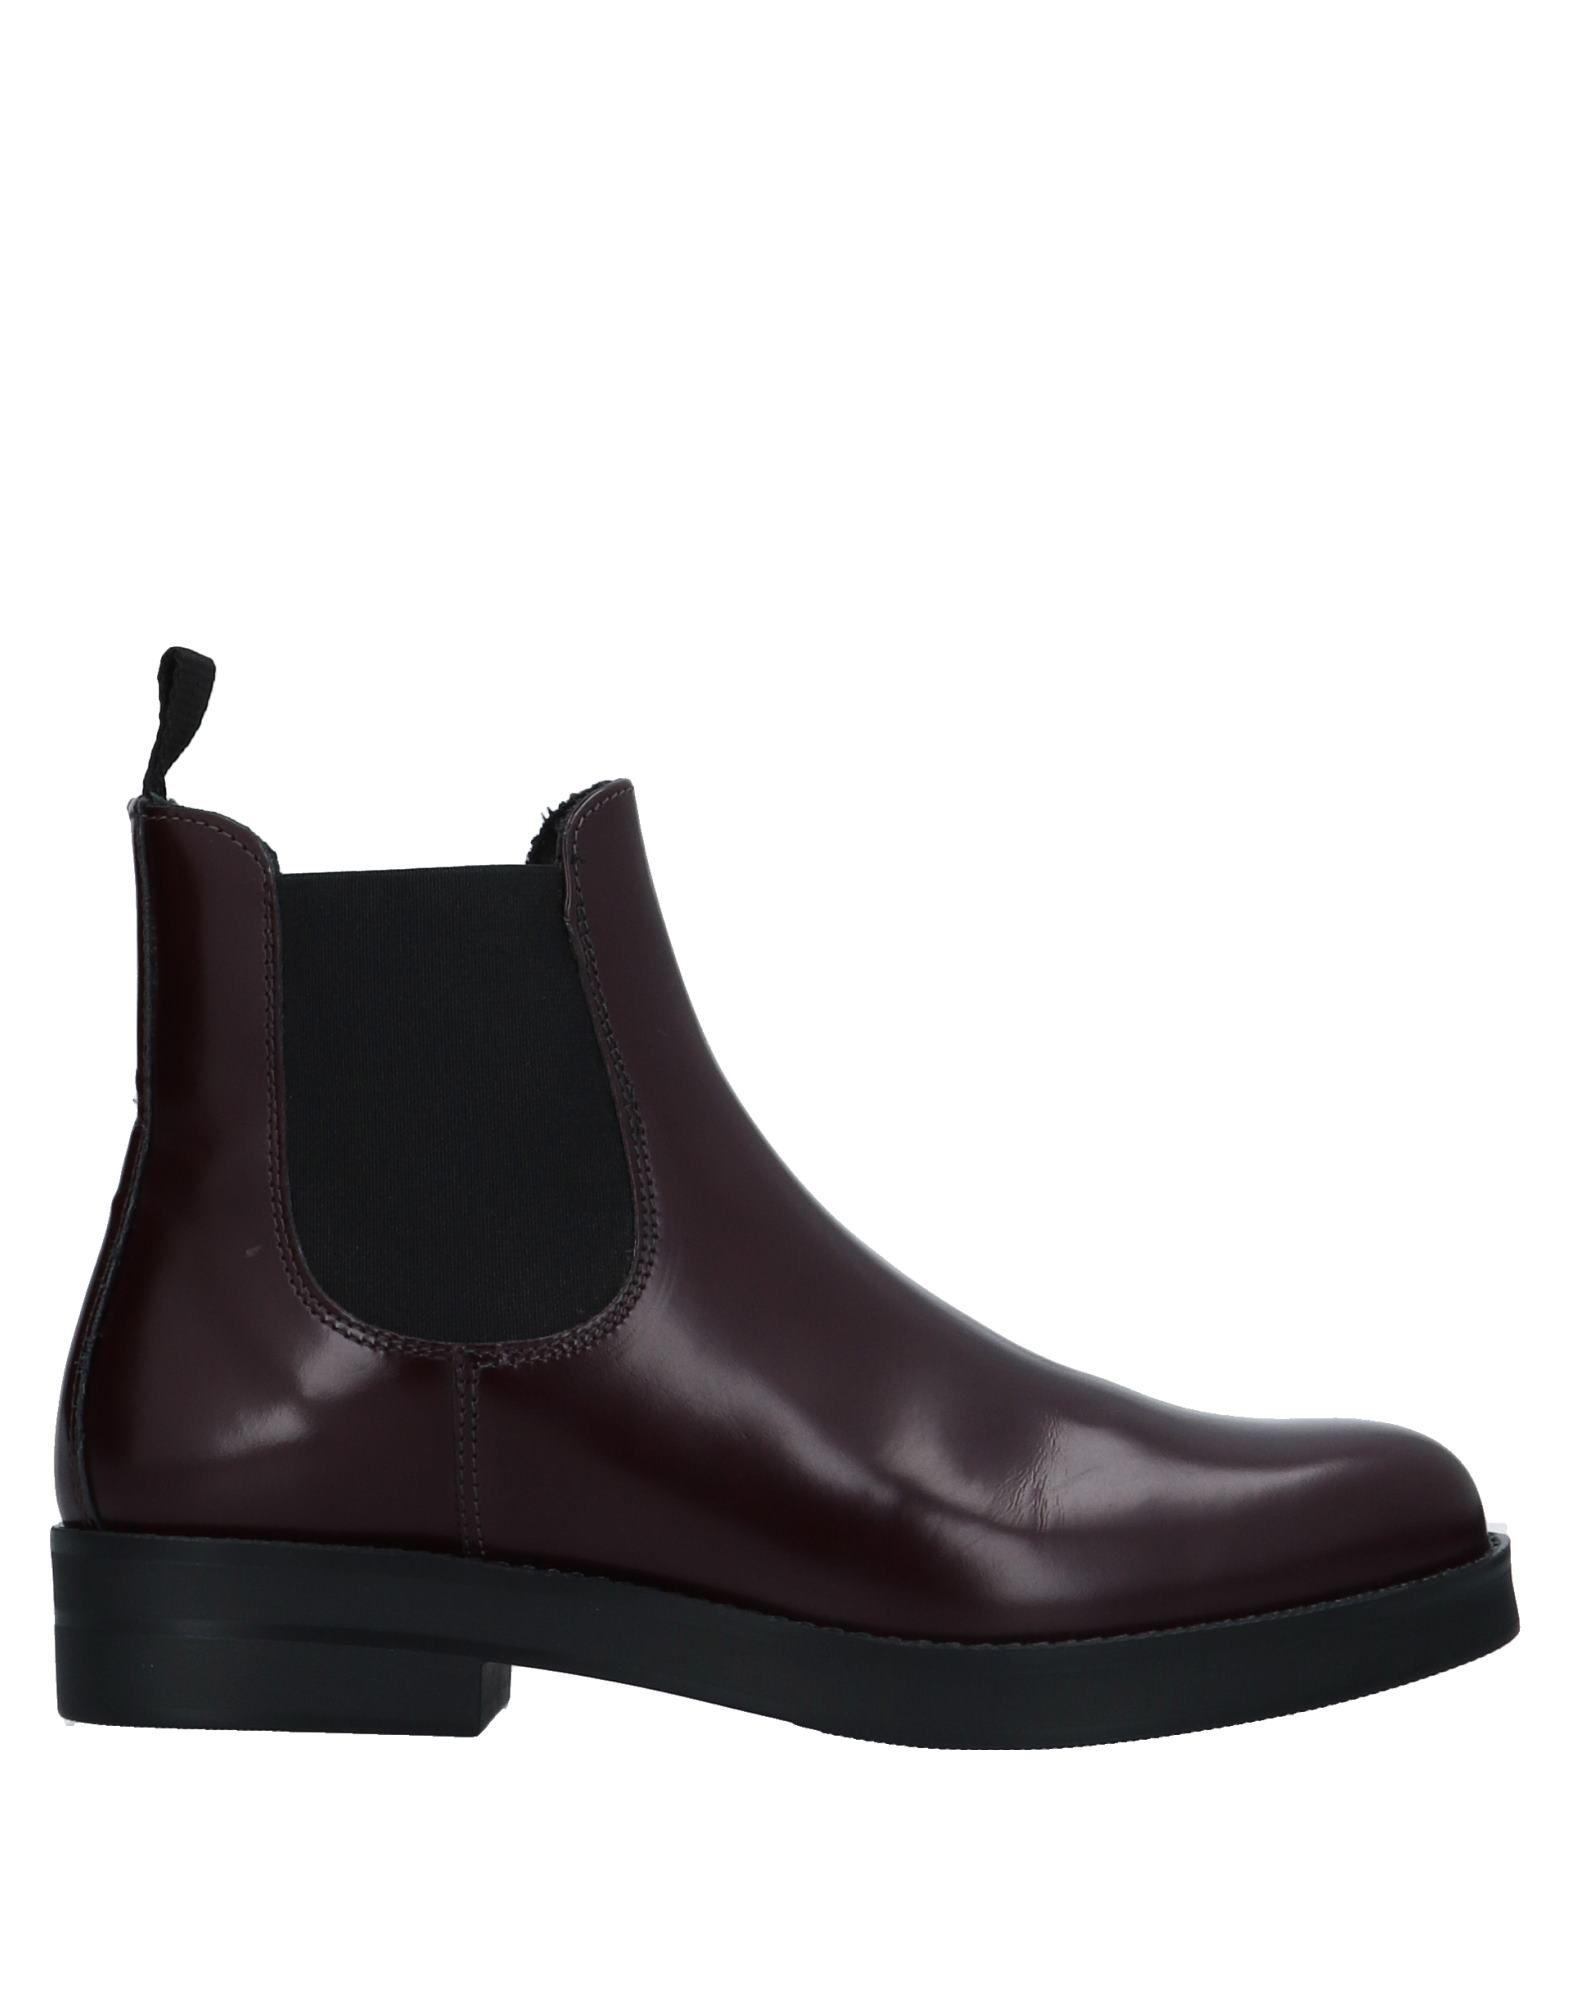 Antica Cuoieria Chelsea Boots Damen  11537610NL Gute Qualität beliebte Schuhe